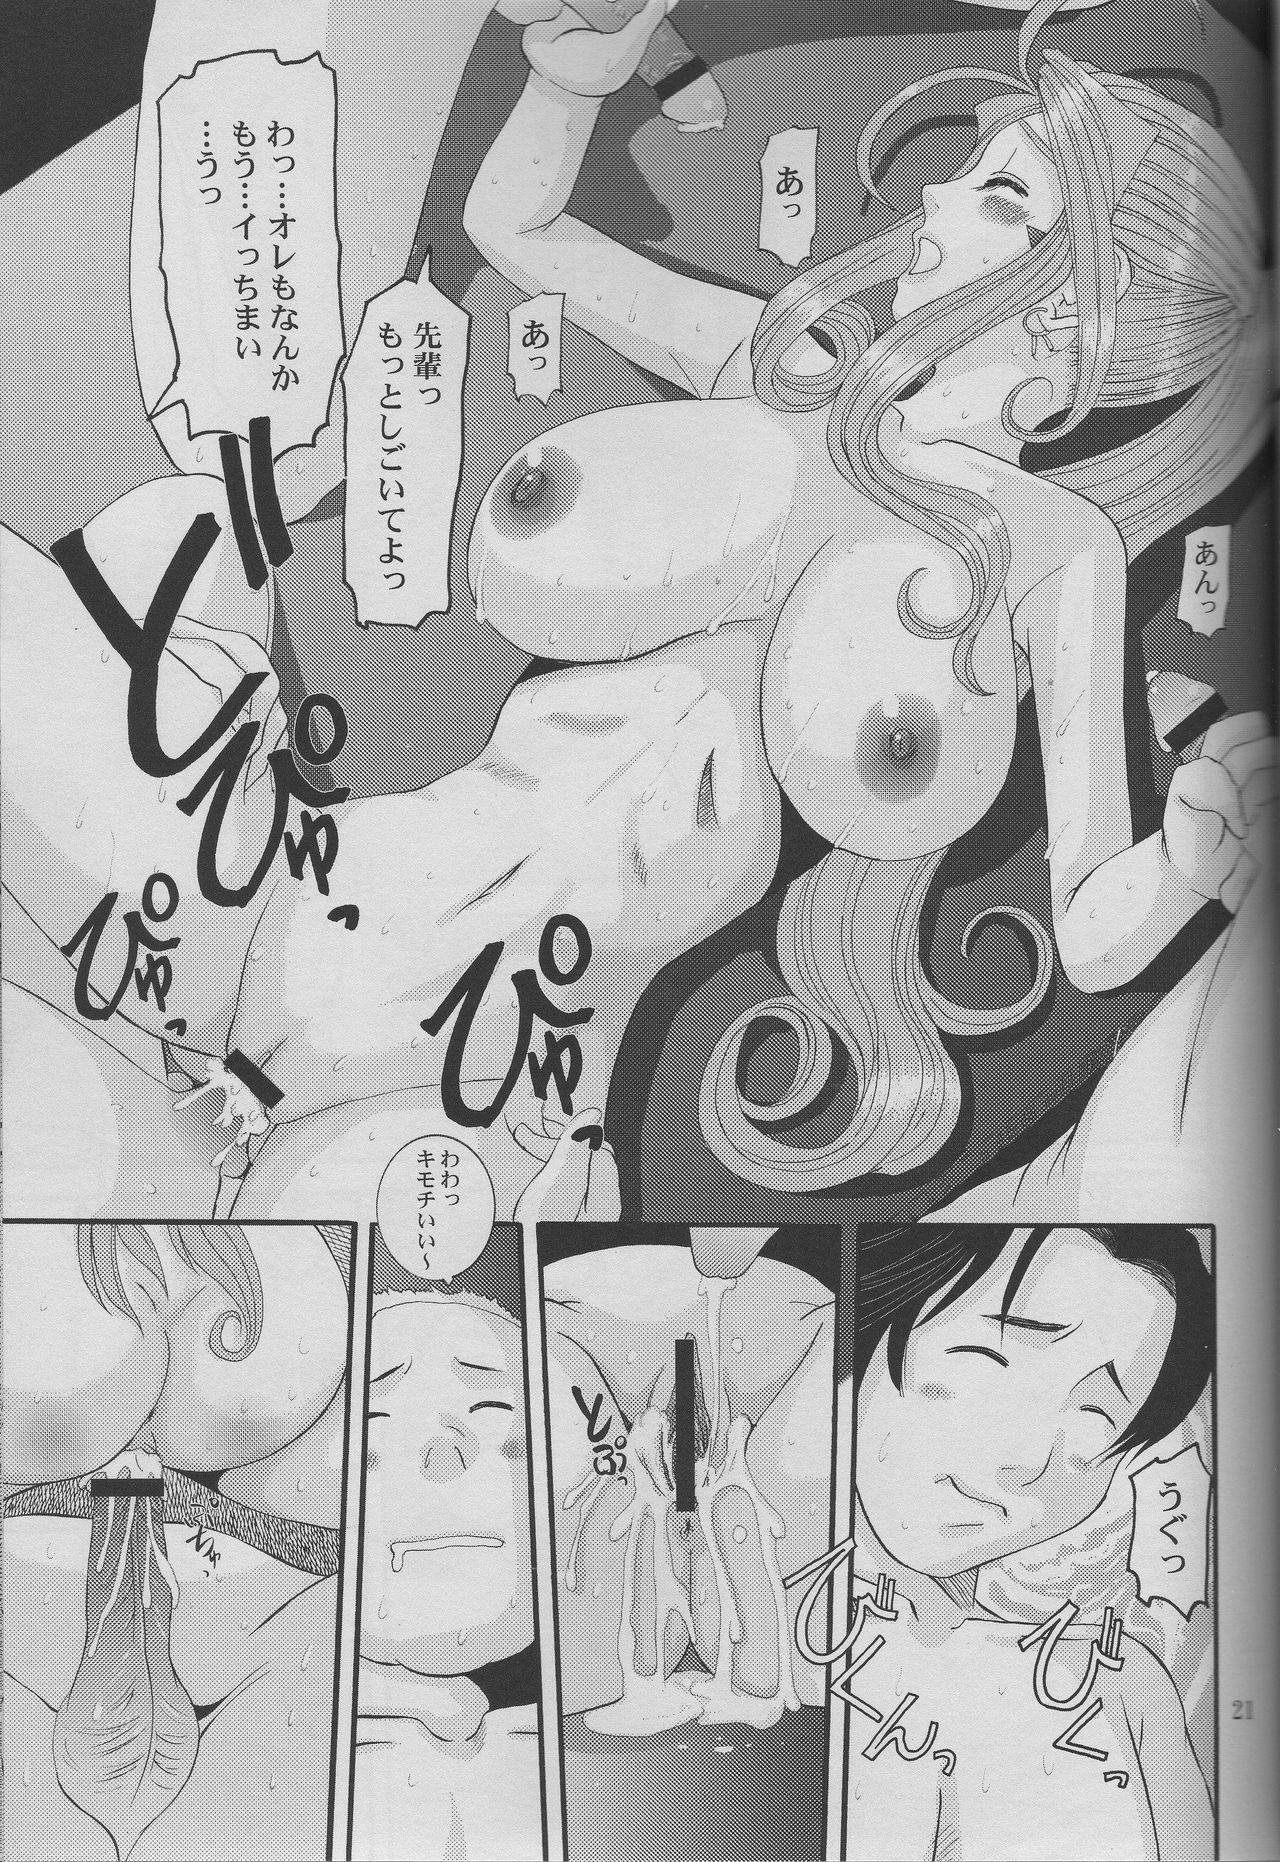 Nightmare of My Goddess Vol. 9 19